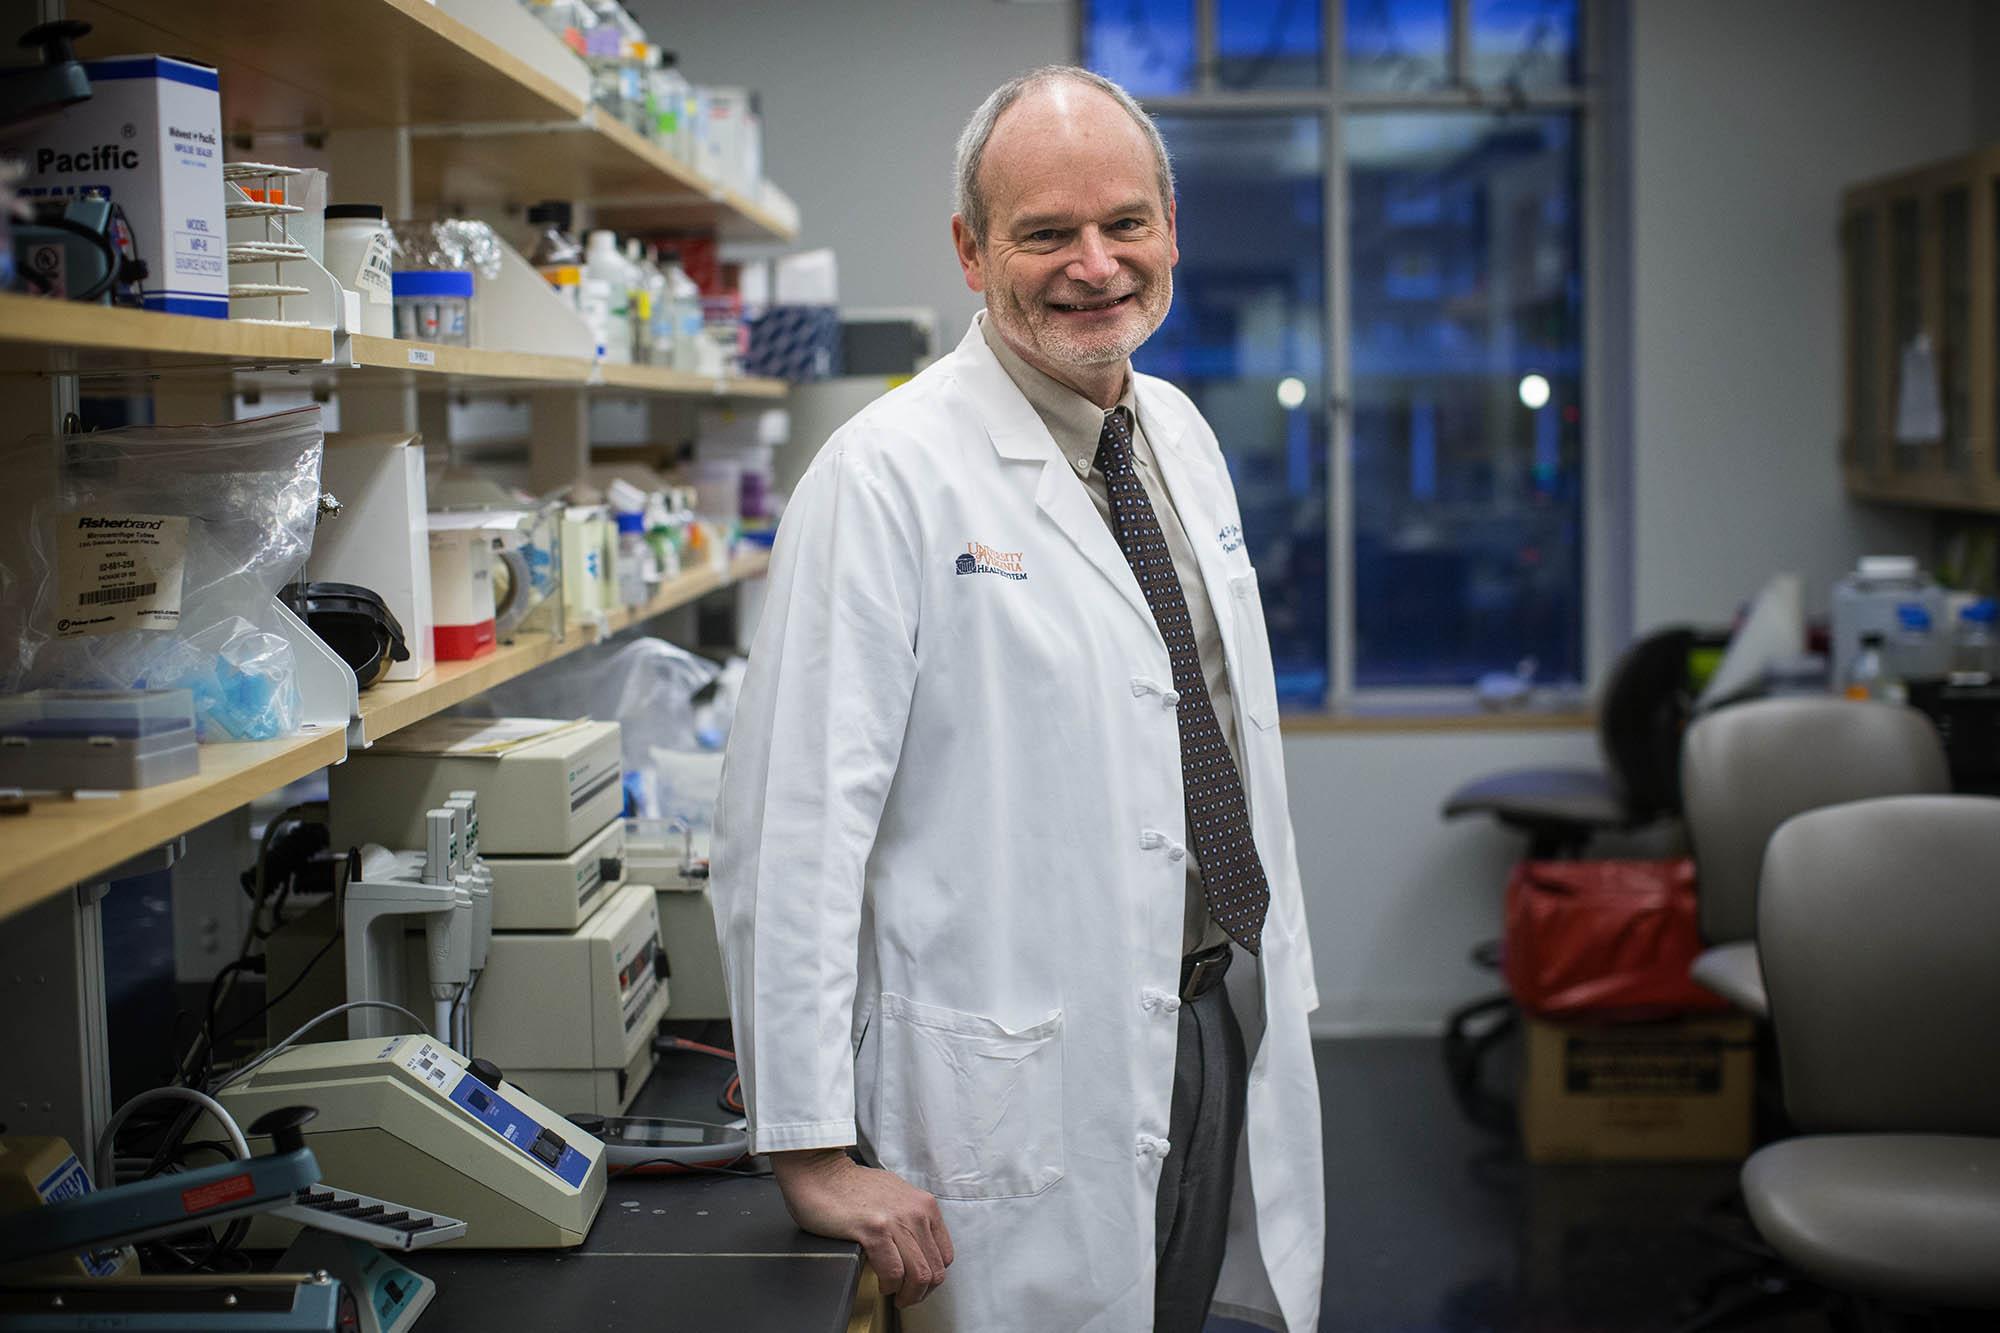 Dr. William Petri is the Wade Hampton Frost Professor of Medicine. (Photo by Sanjay Suchak, University Communications)